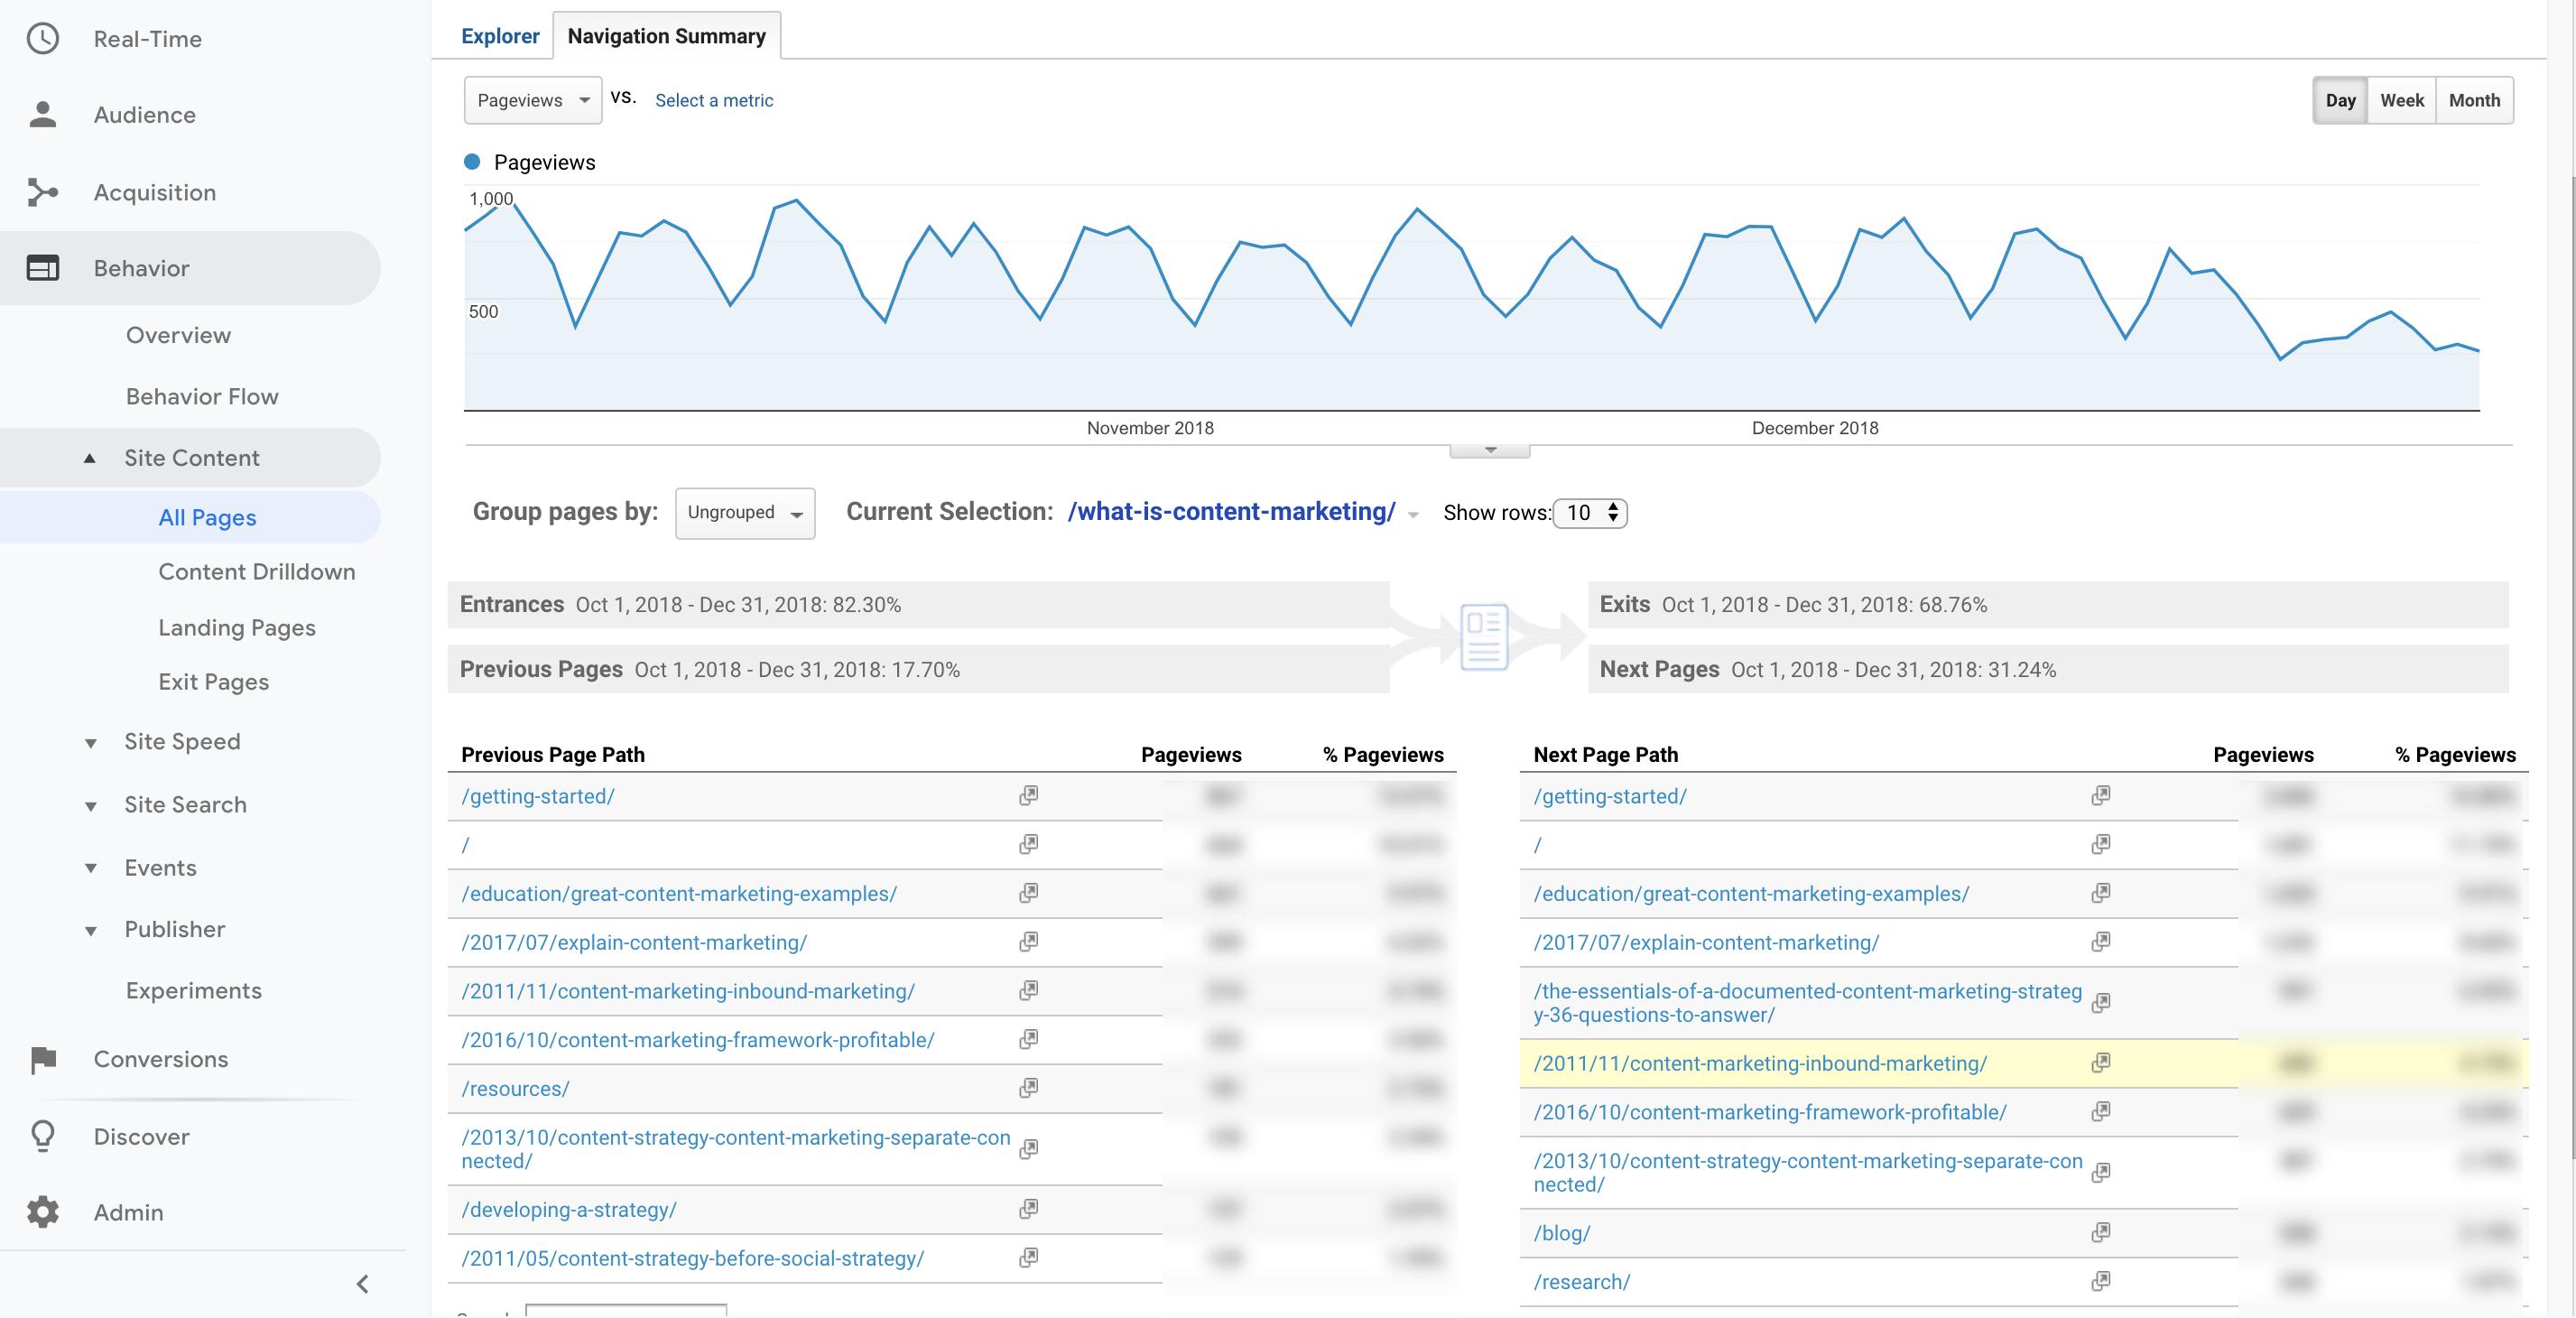 Google Analytics: How to Use Key Reports